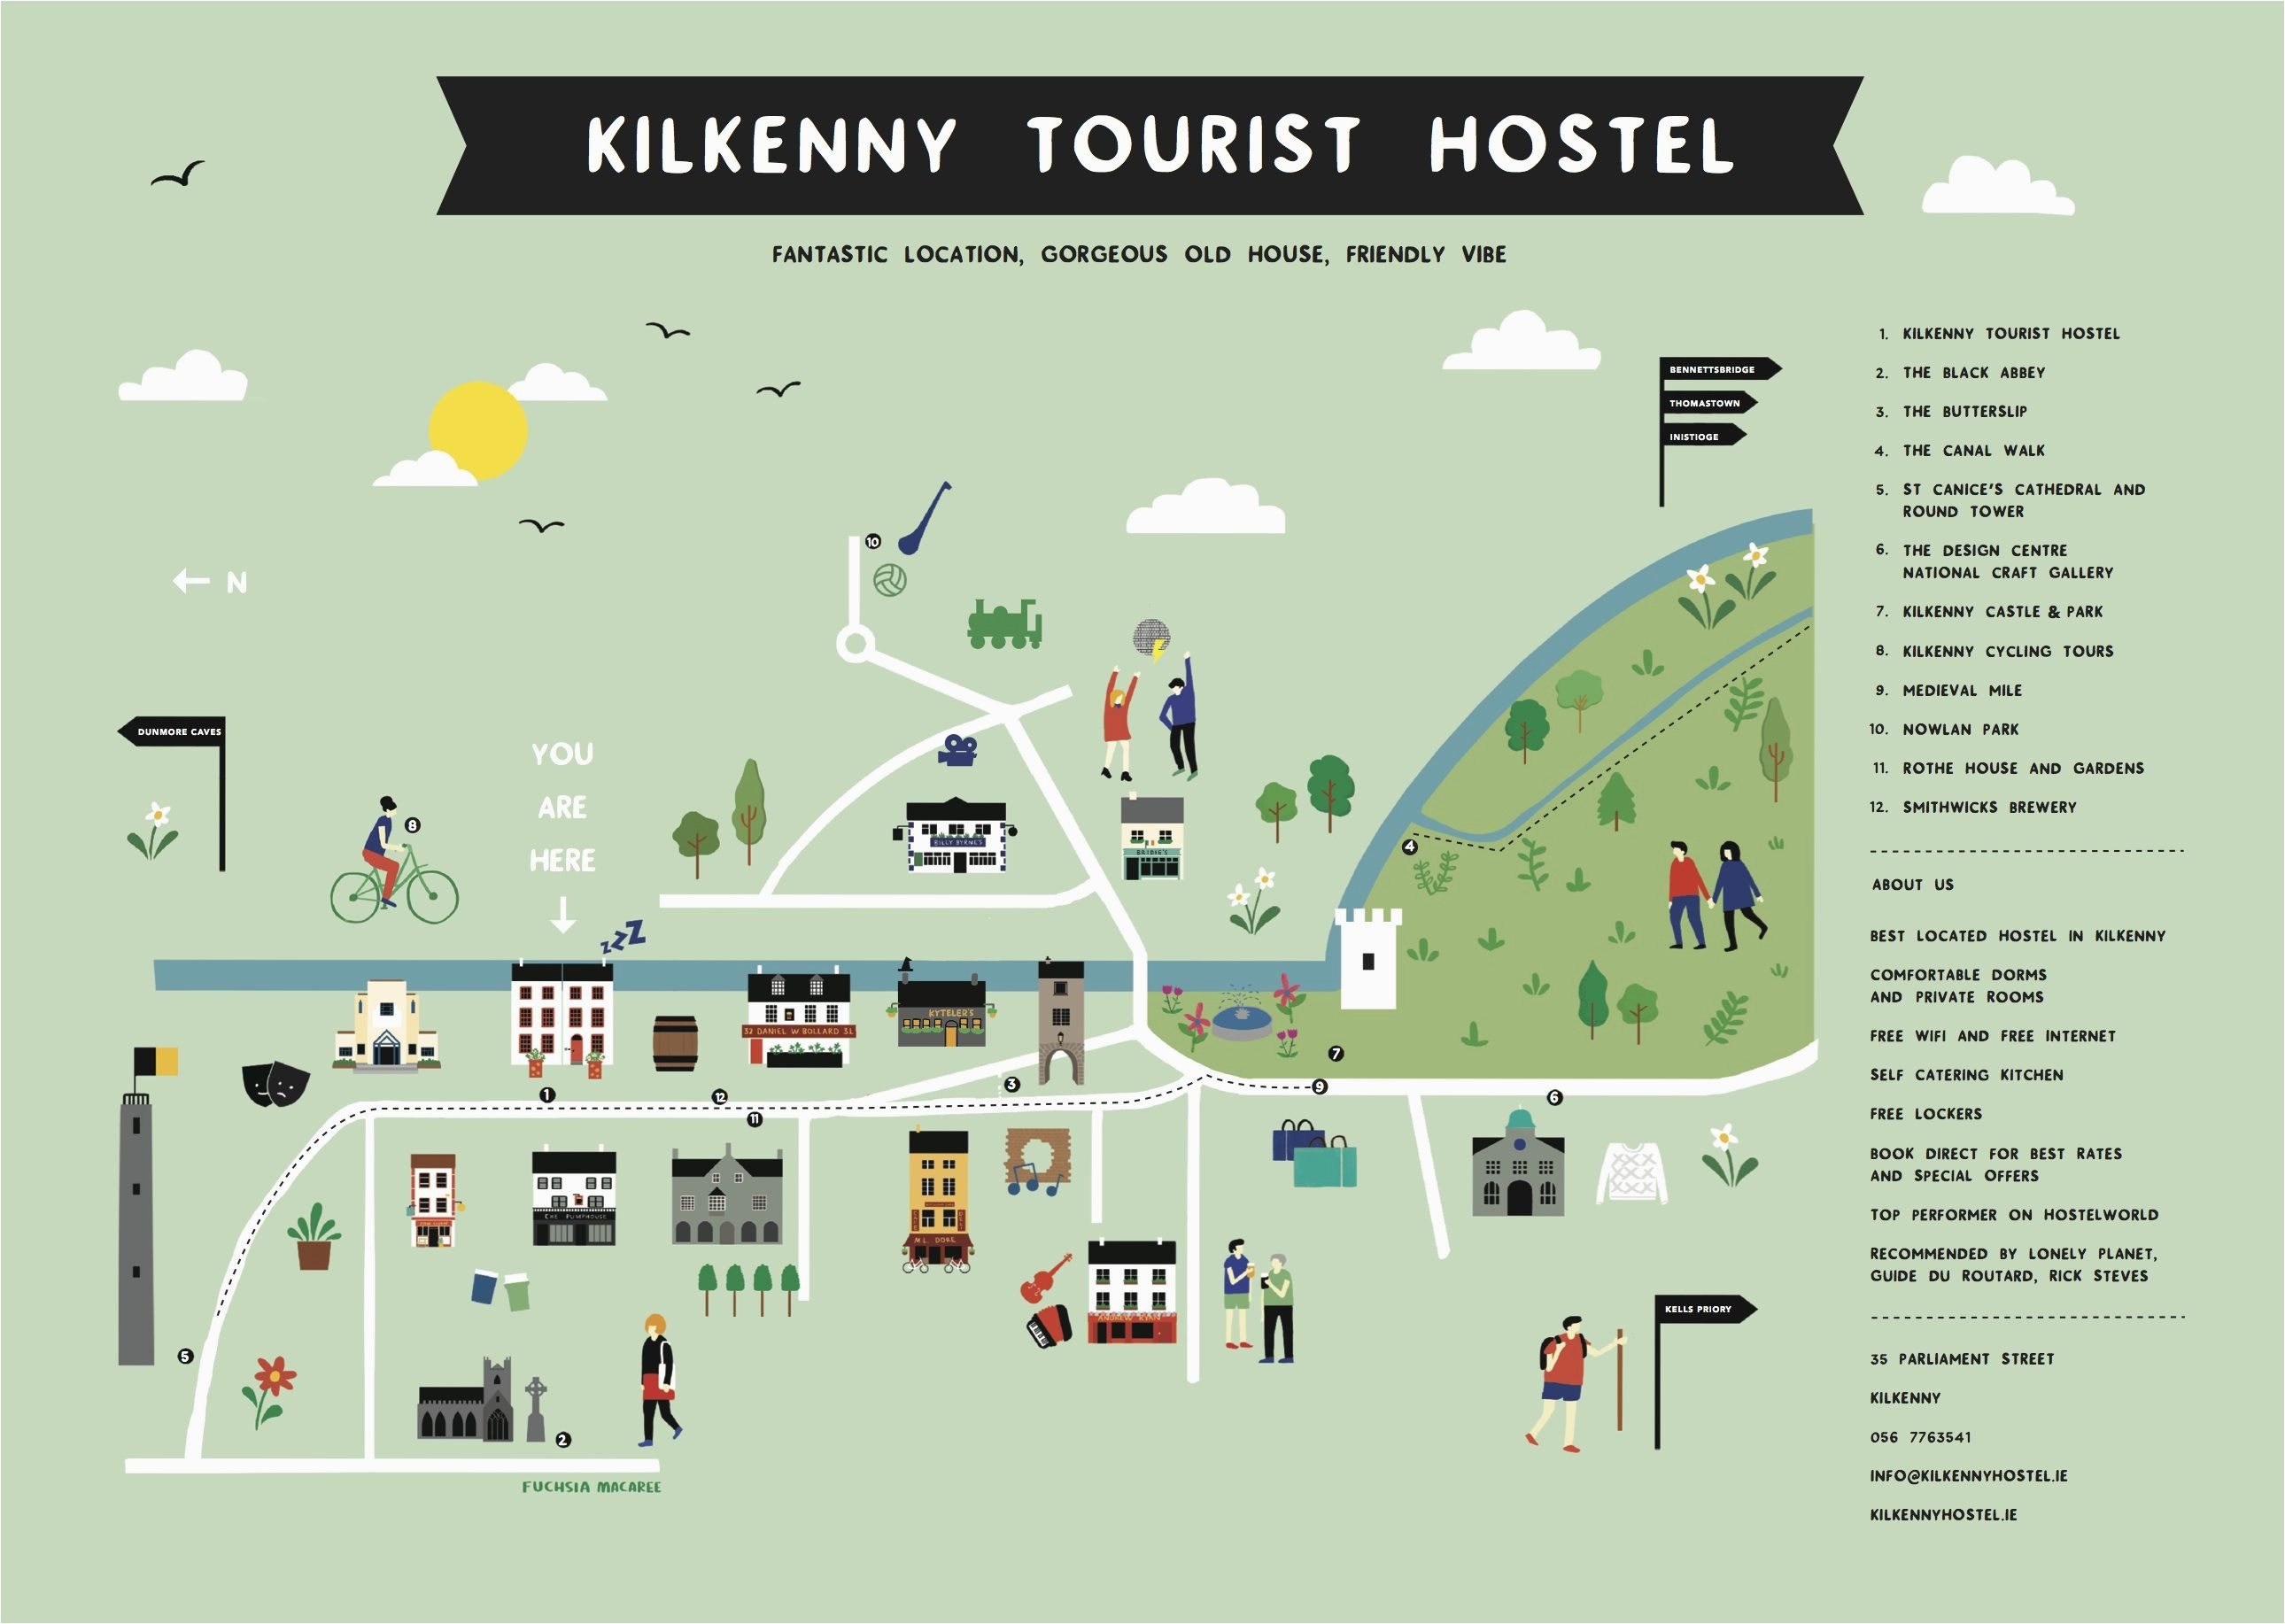 kilkenny tourest hostel map ireland trip 2015 irland